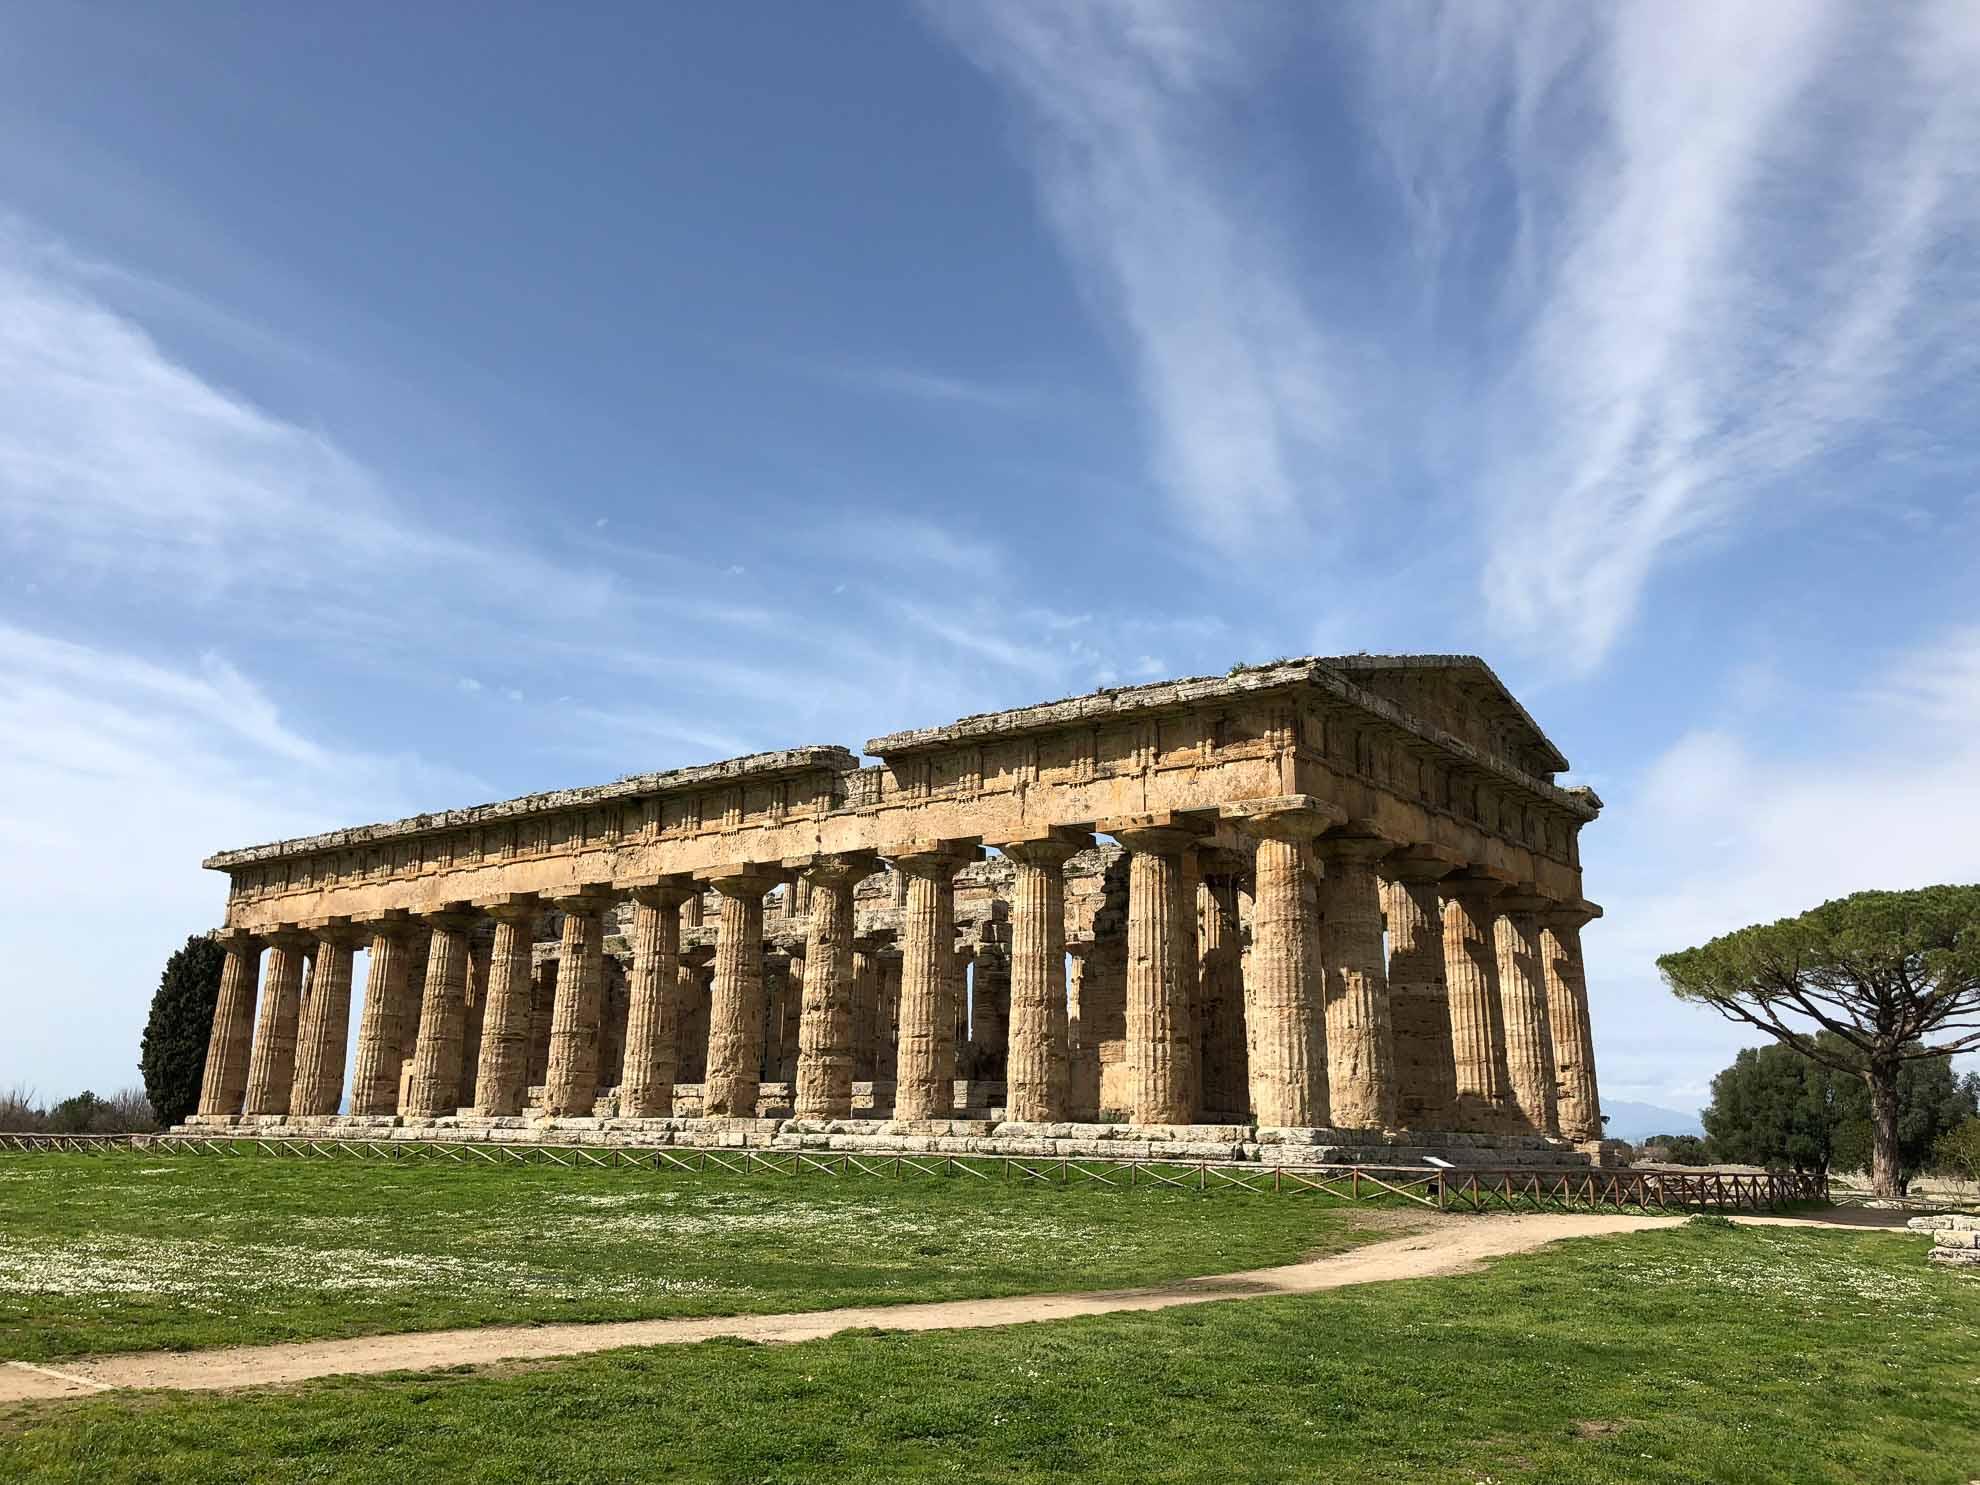 Der Hera-Tempel, ehemals Poseidon-Tempel, ist besonders gut erhalten.